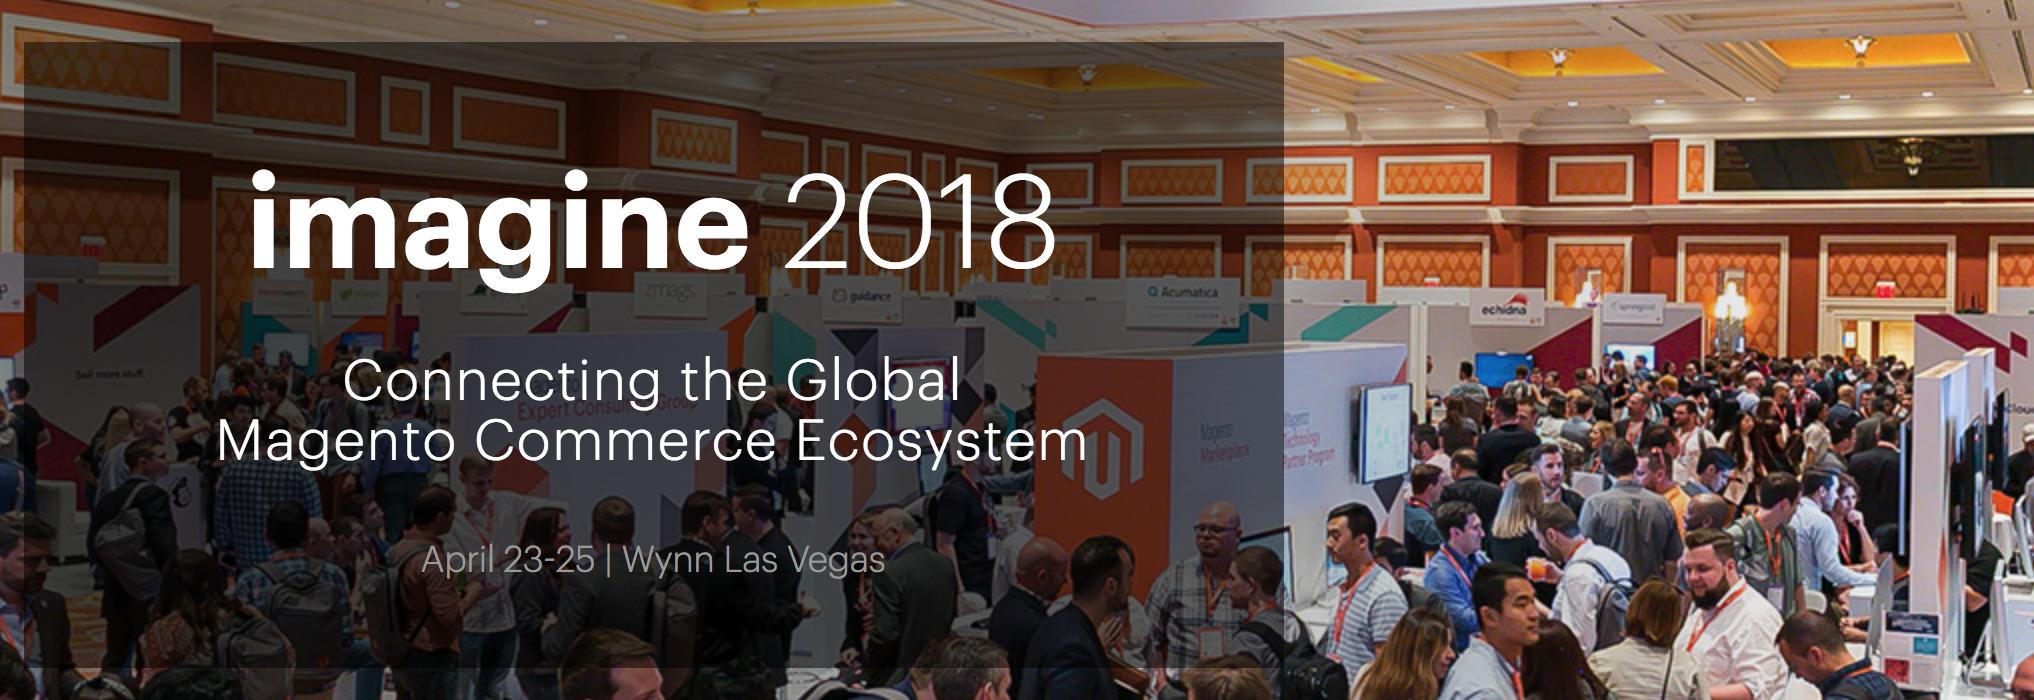 Ecommerce industry trends in Las Vegas